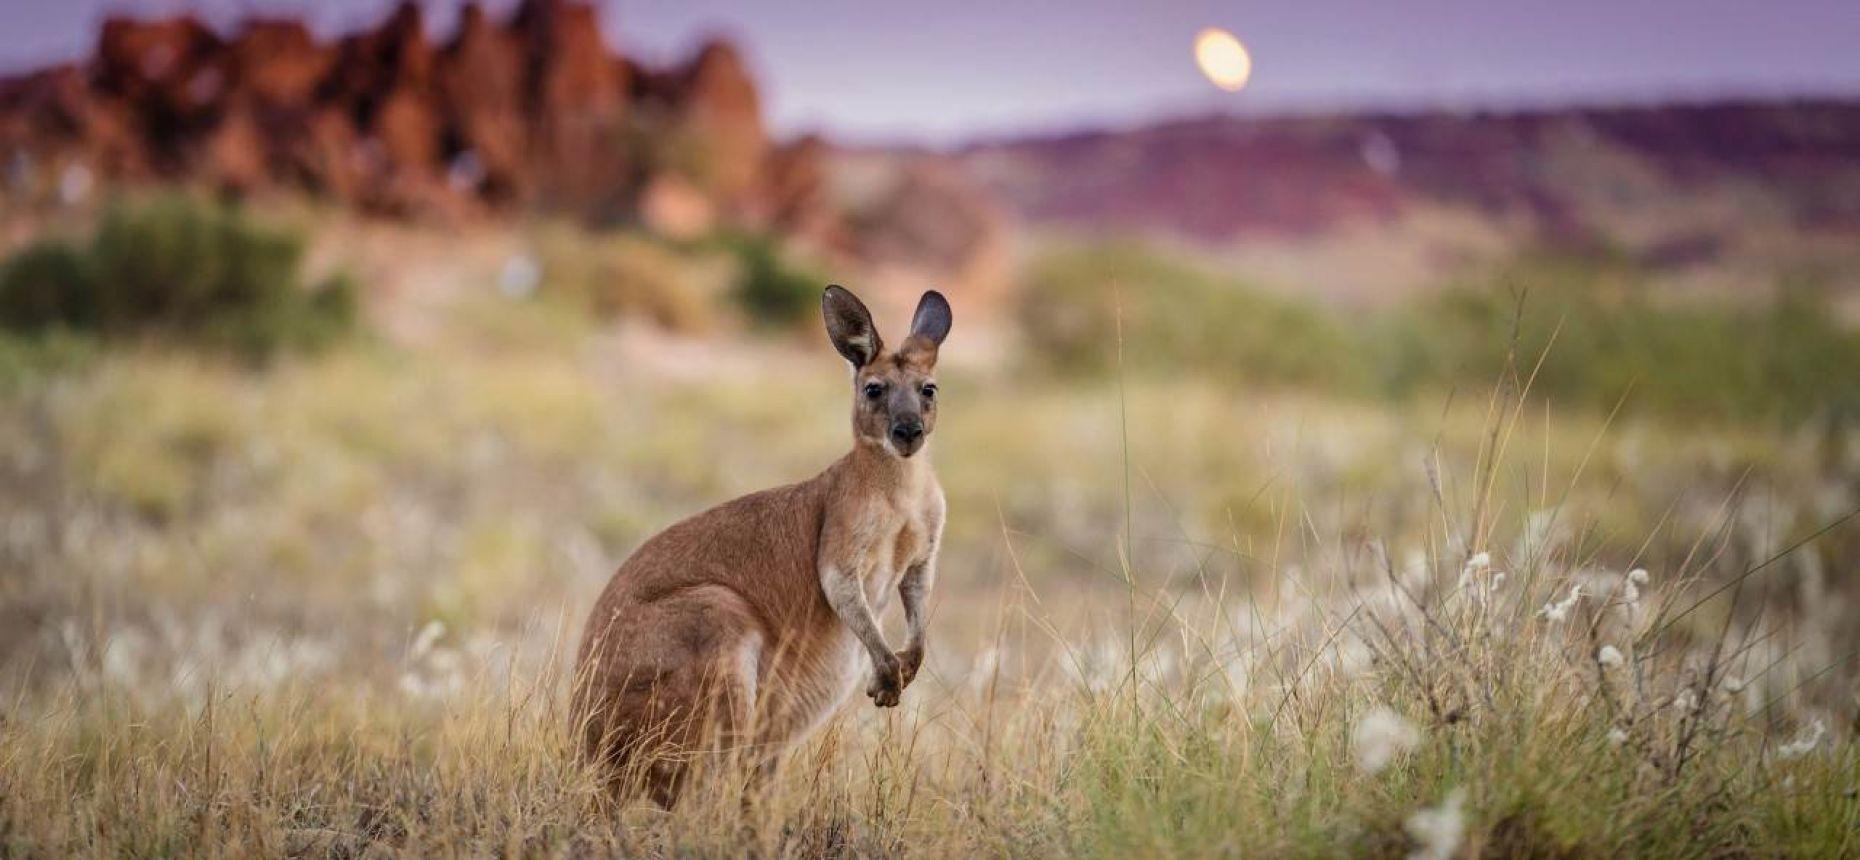 Миф о названии кенгуру